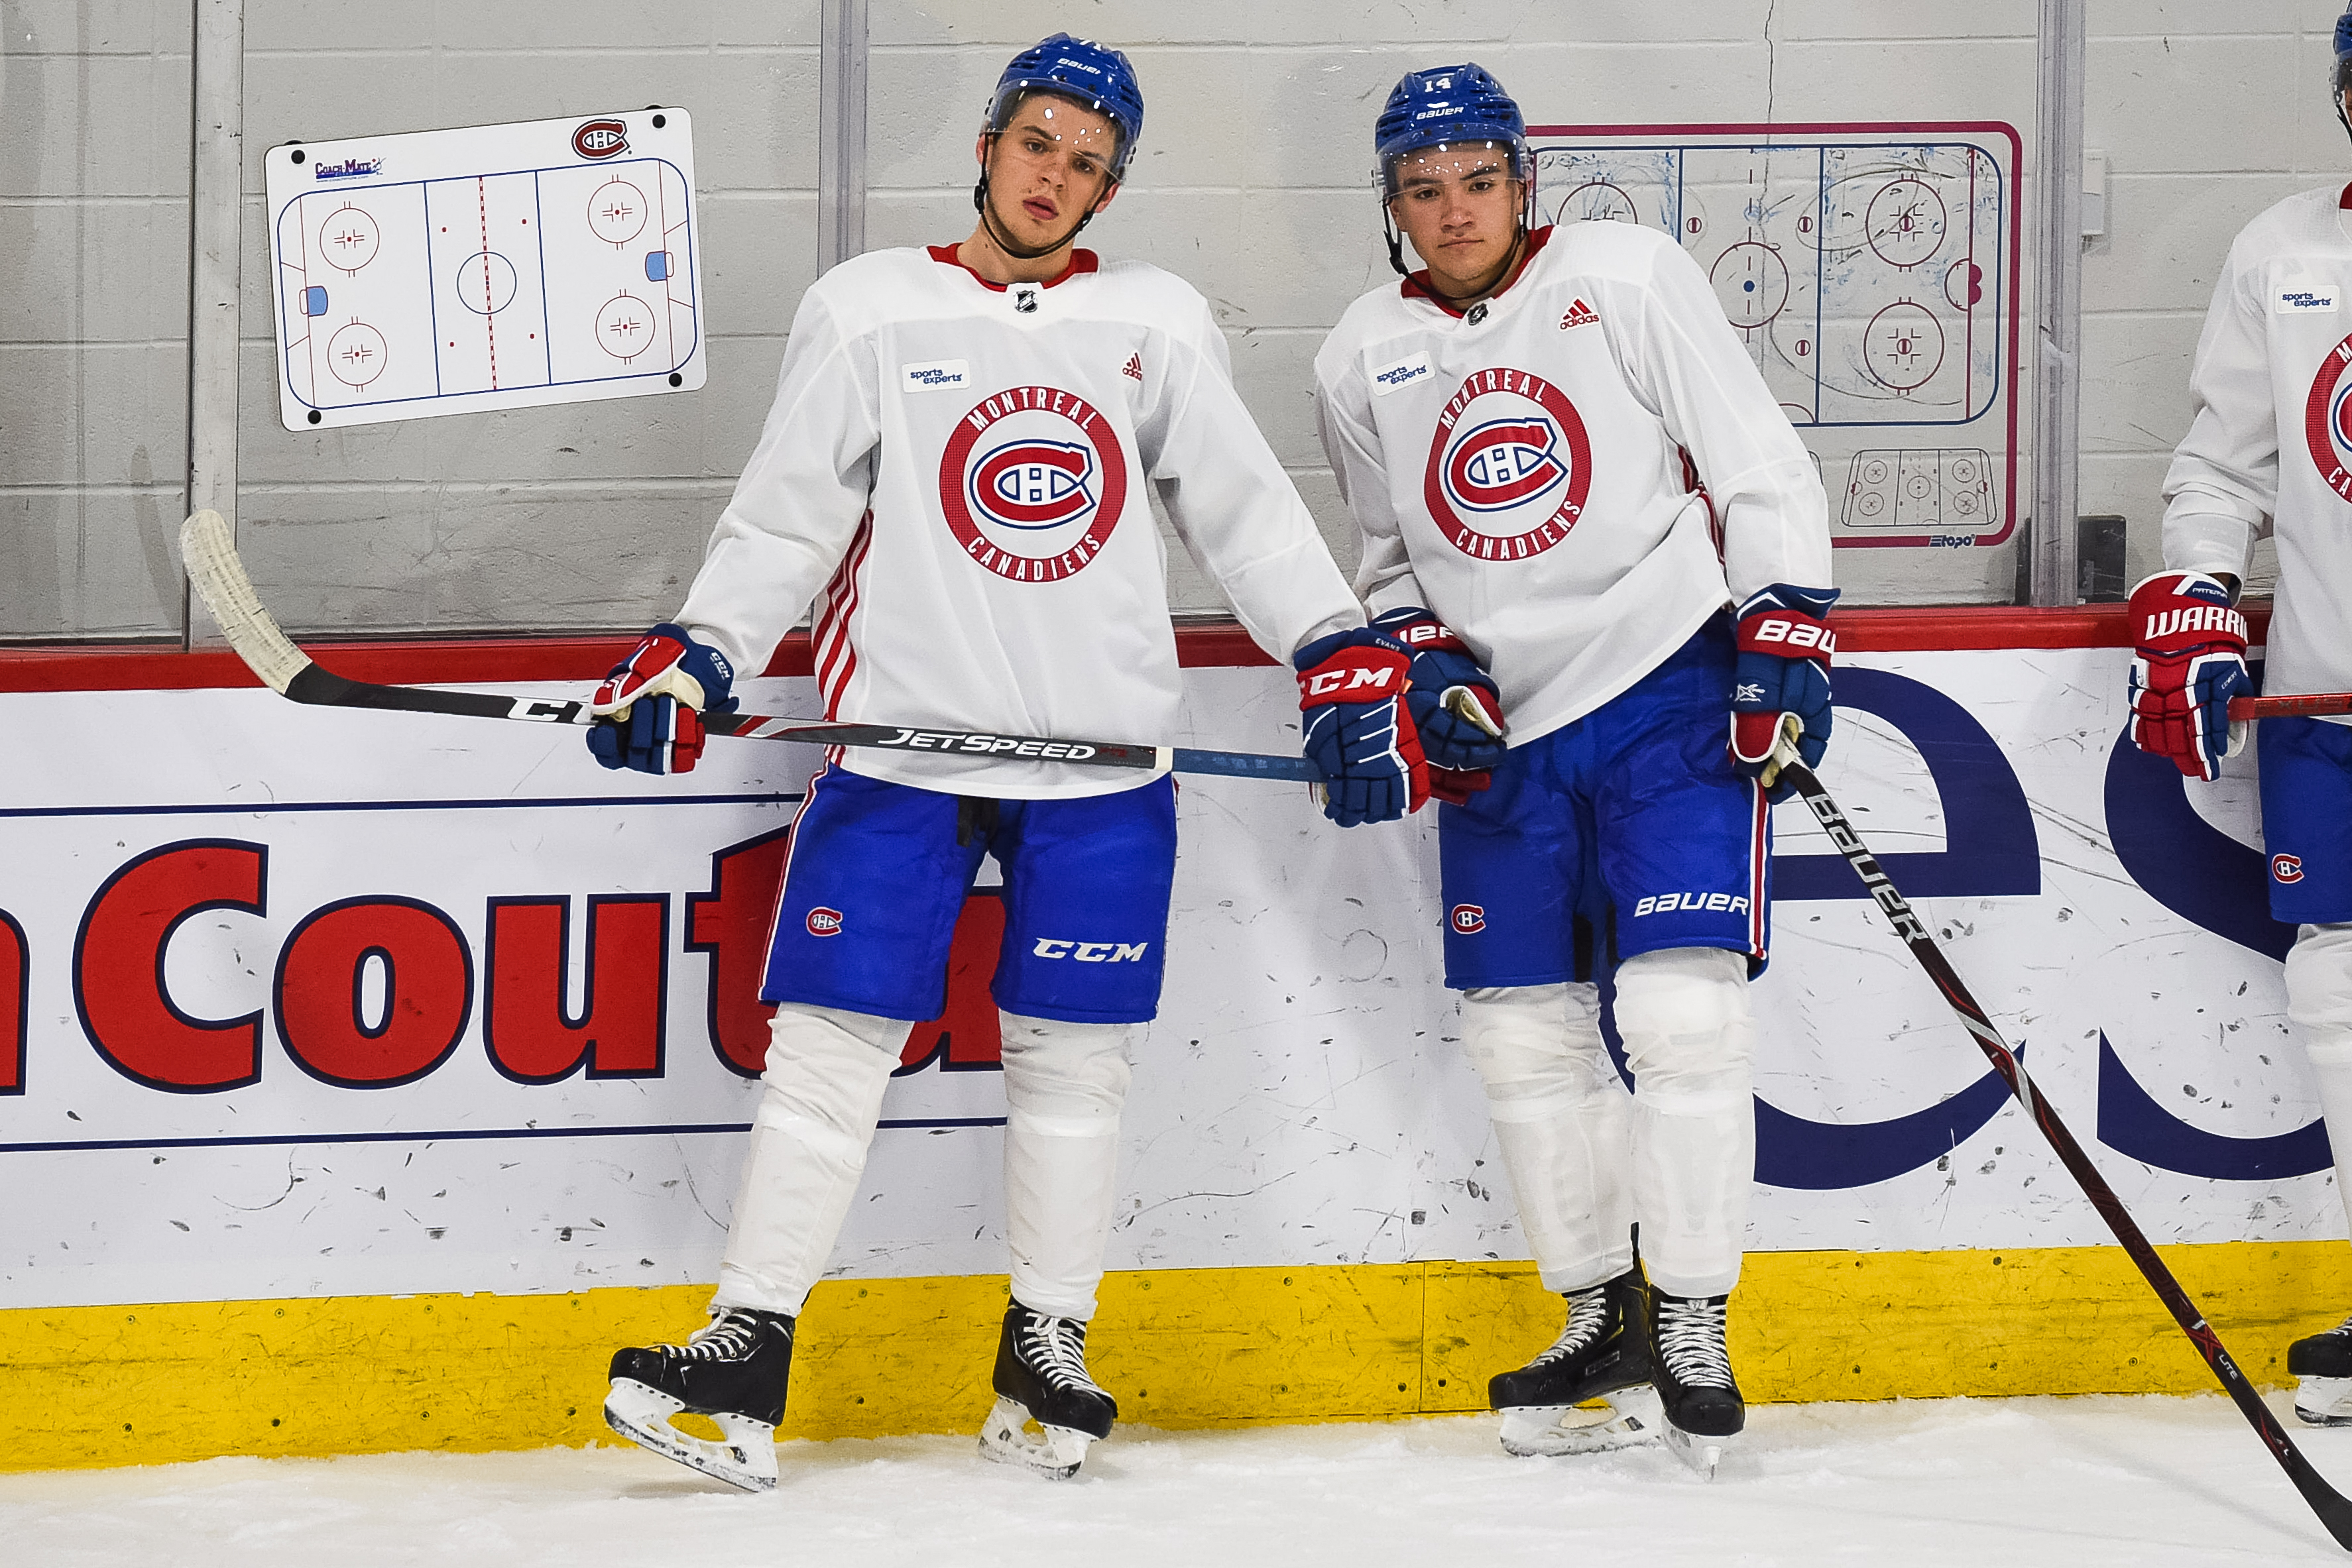 NHL: JUN 26 Canadiens Development Camp